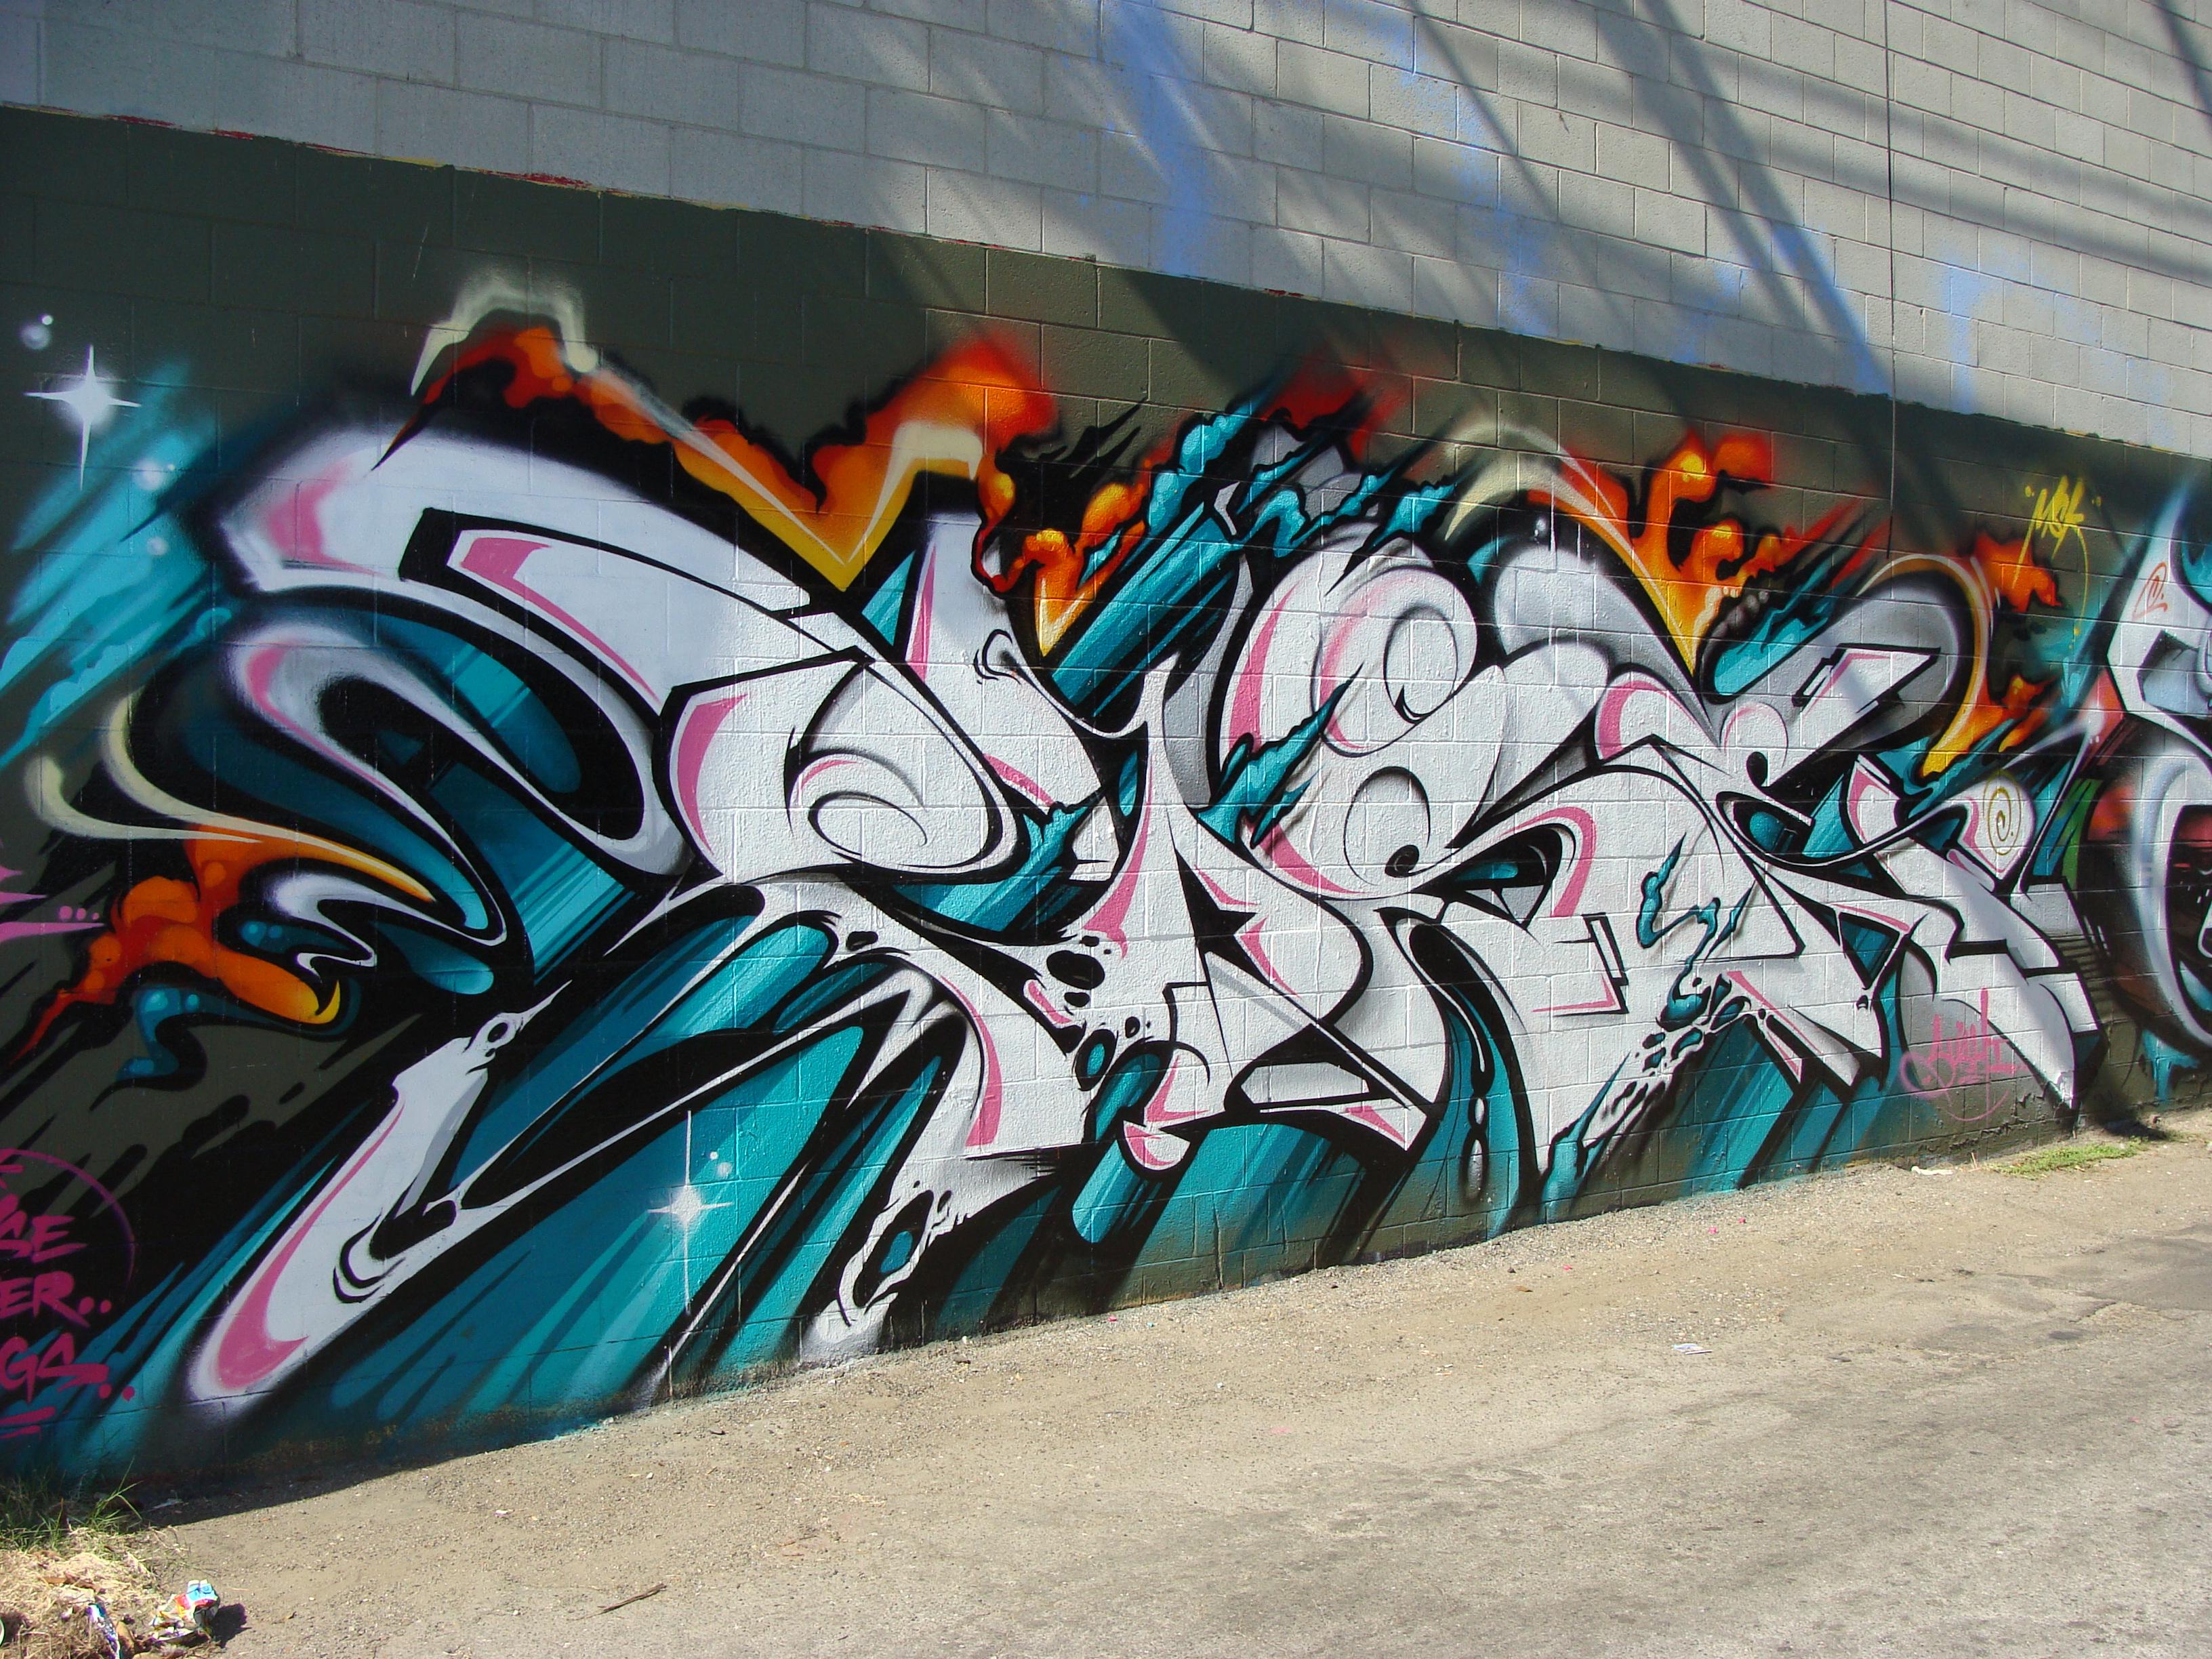 Графити смотреть картинки